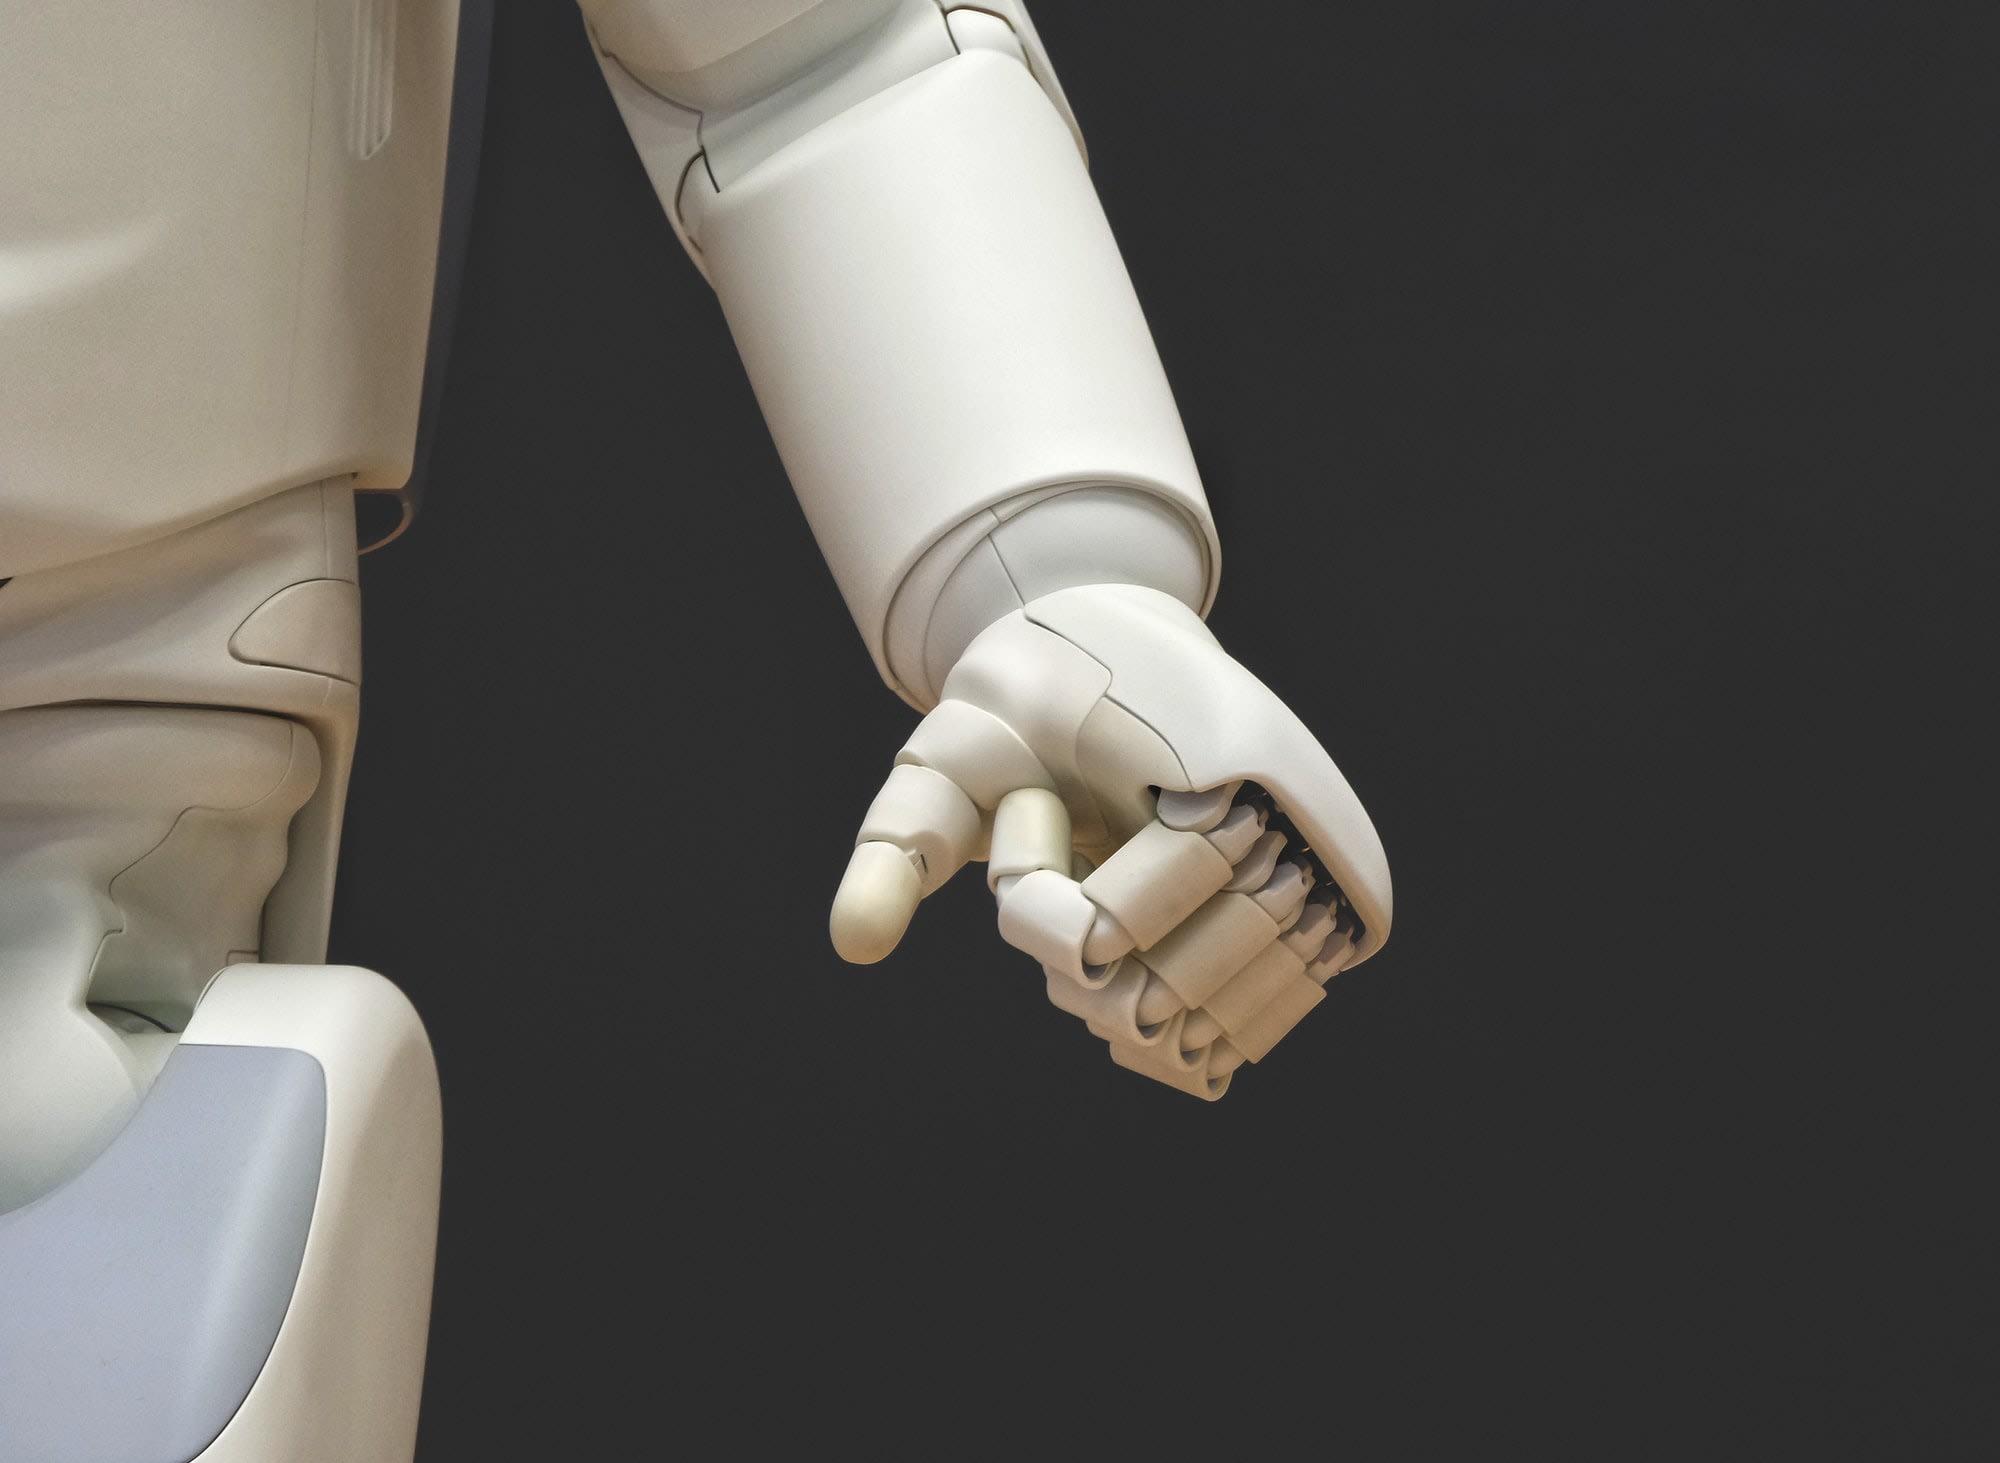 AI-900 - Journey to get the exam